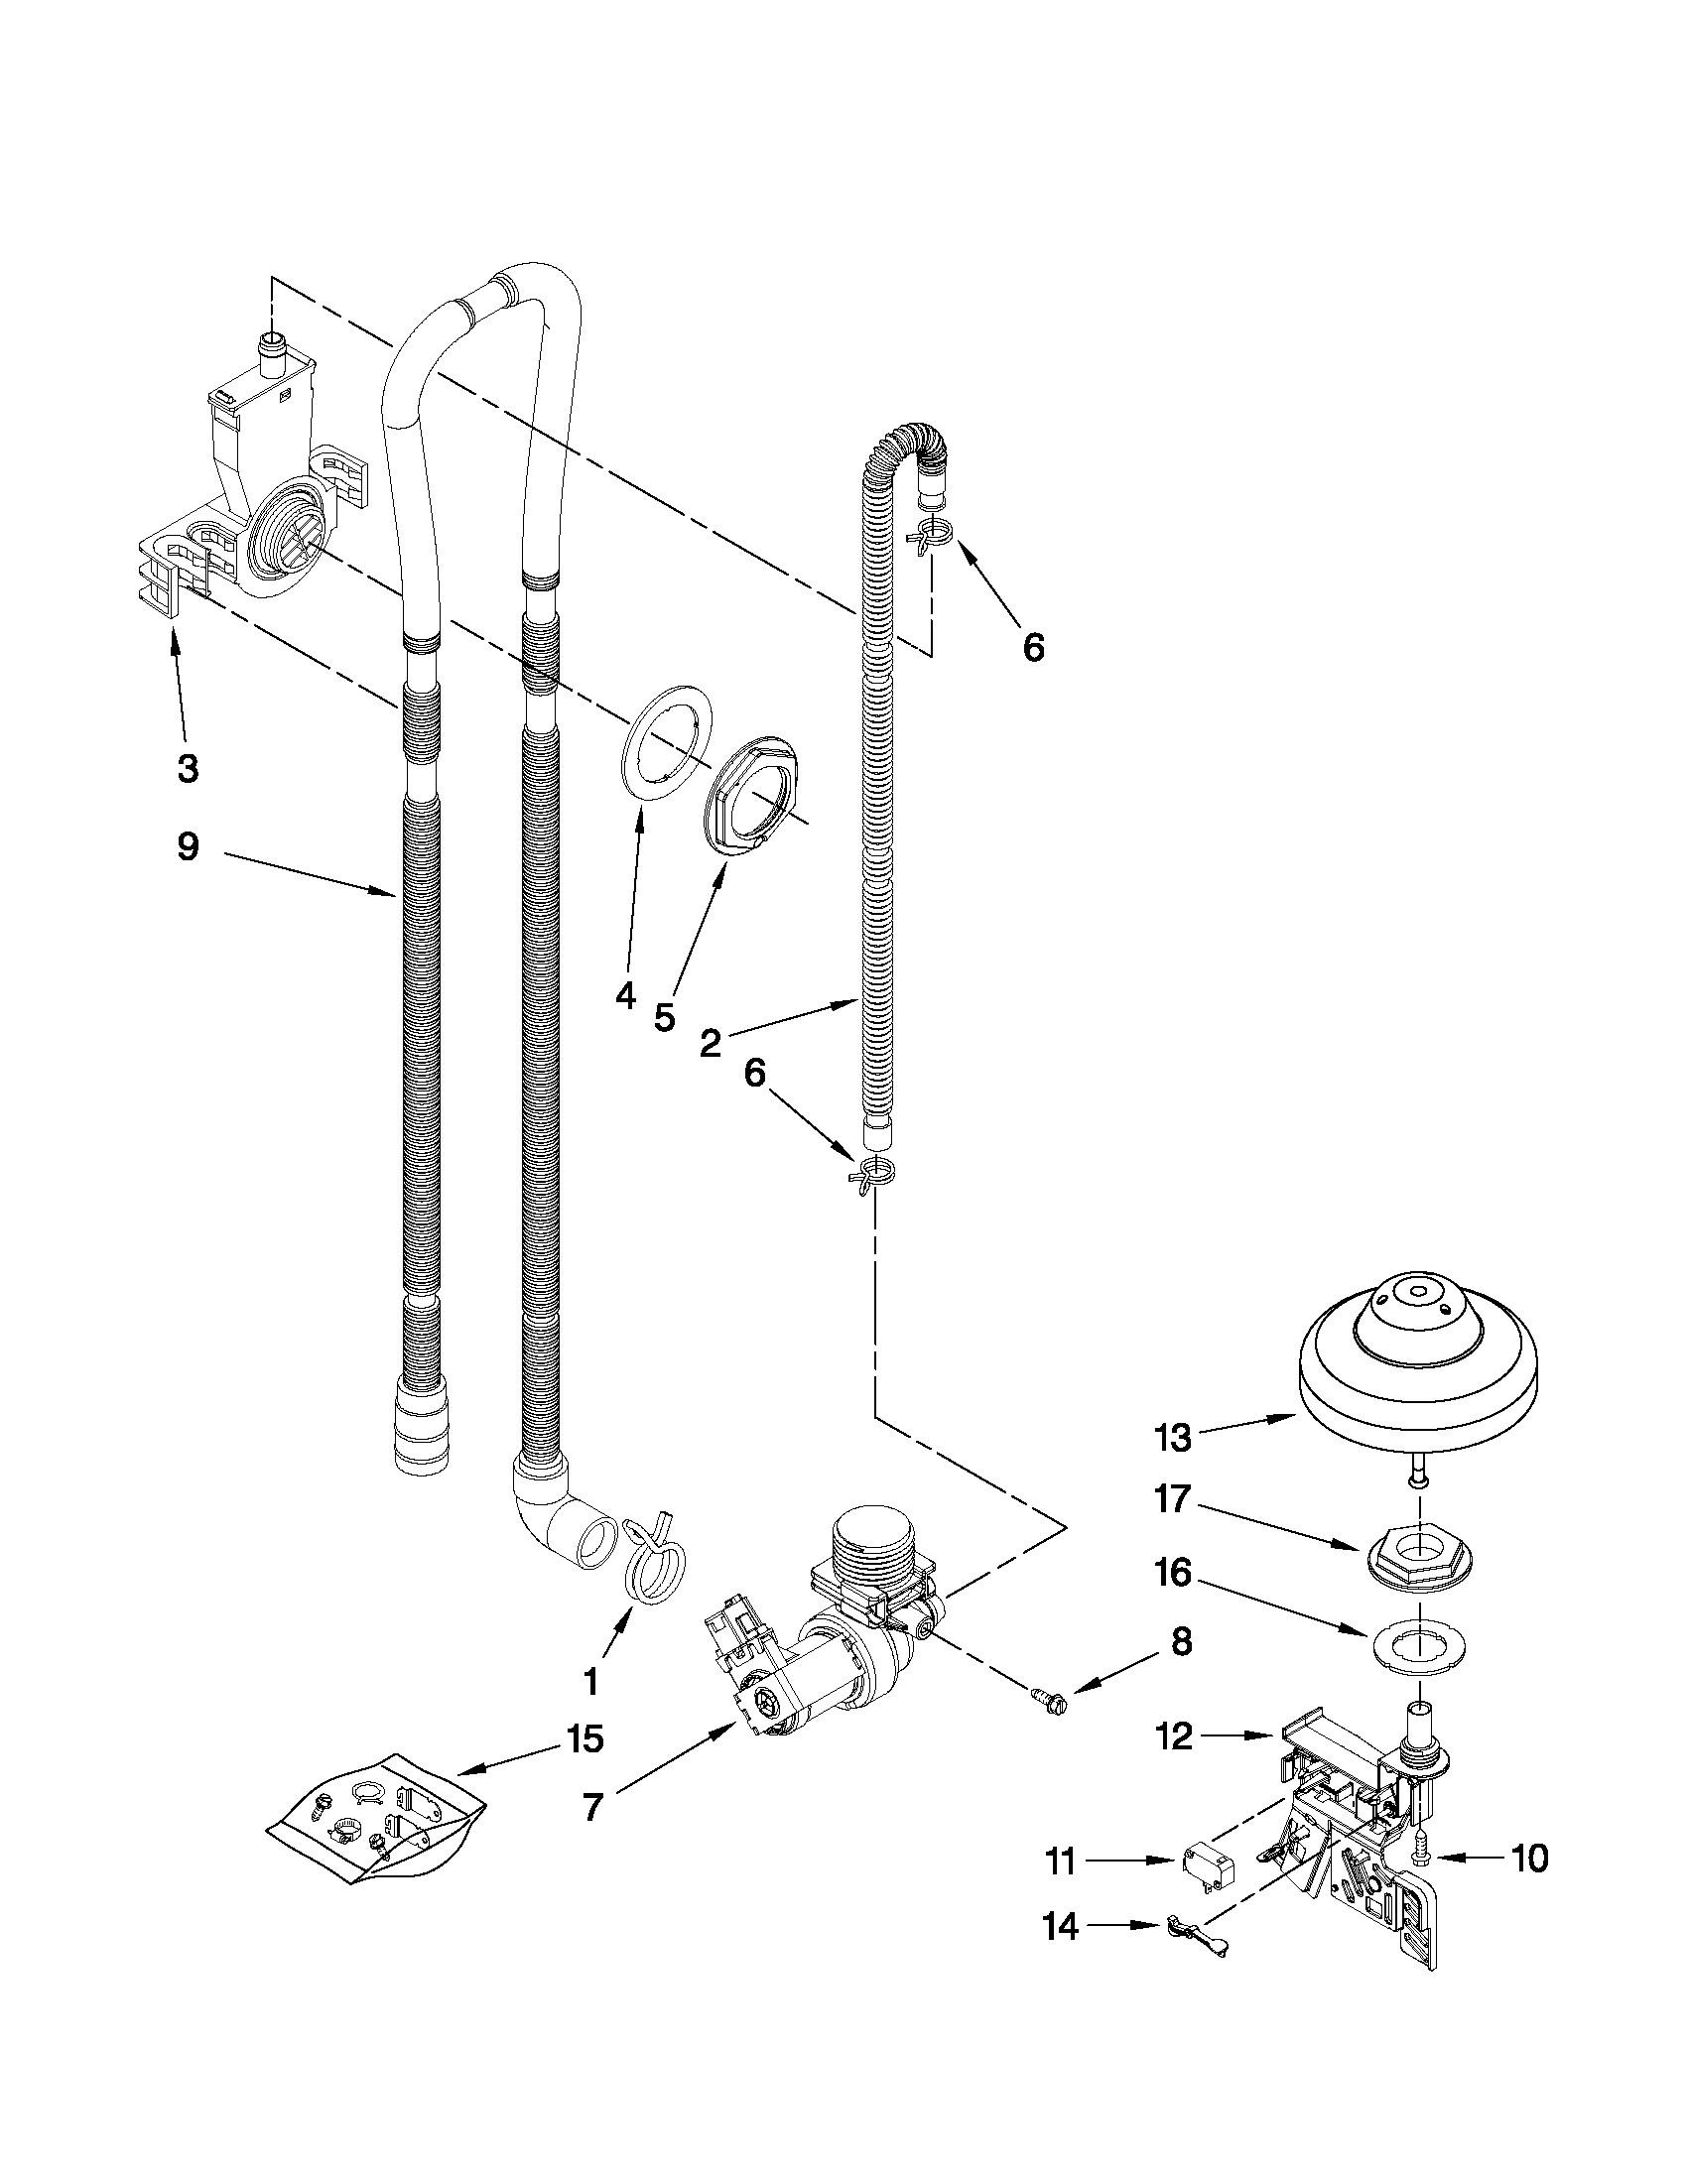 Frigidaire Gallery Dishwasher Parts Diagram